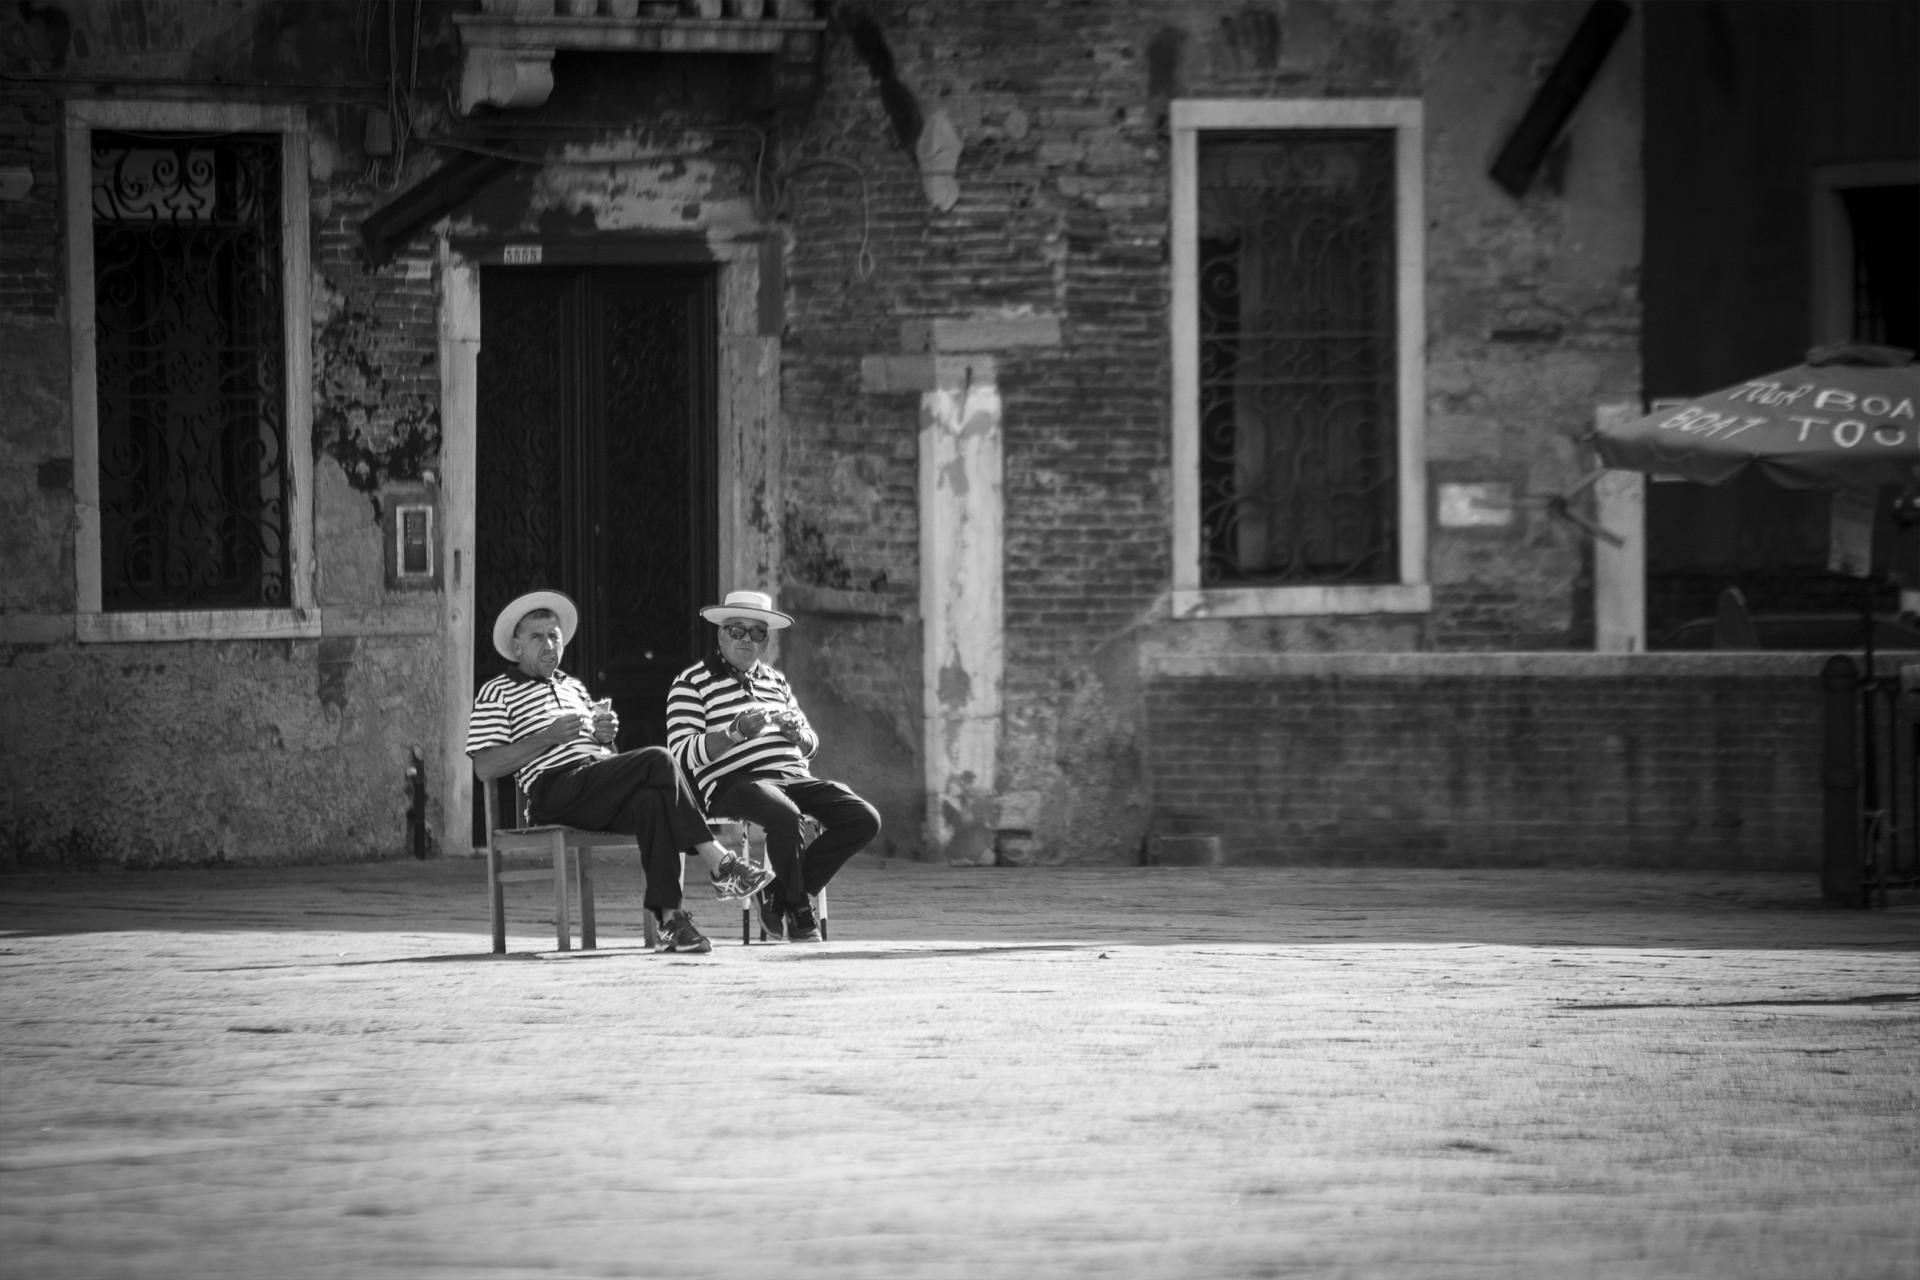 Venezia - Italy